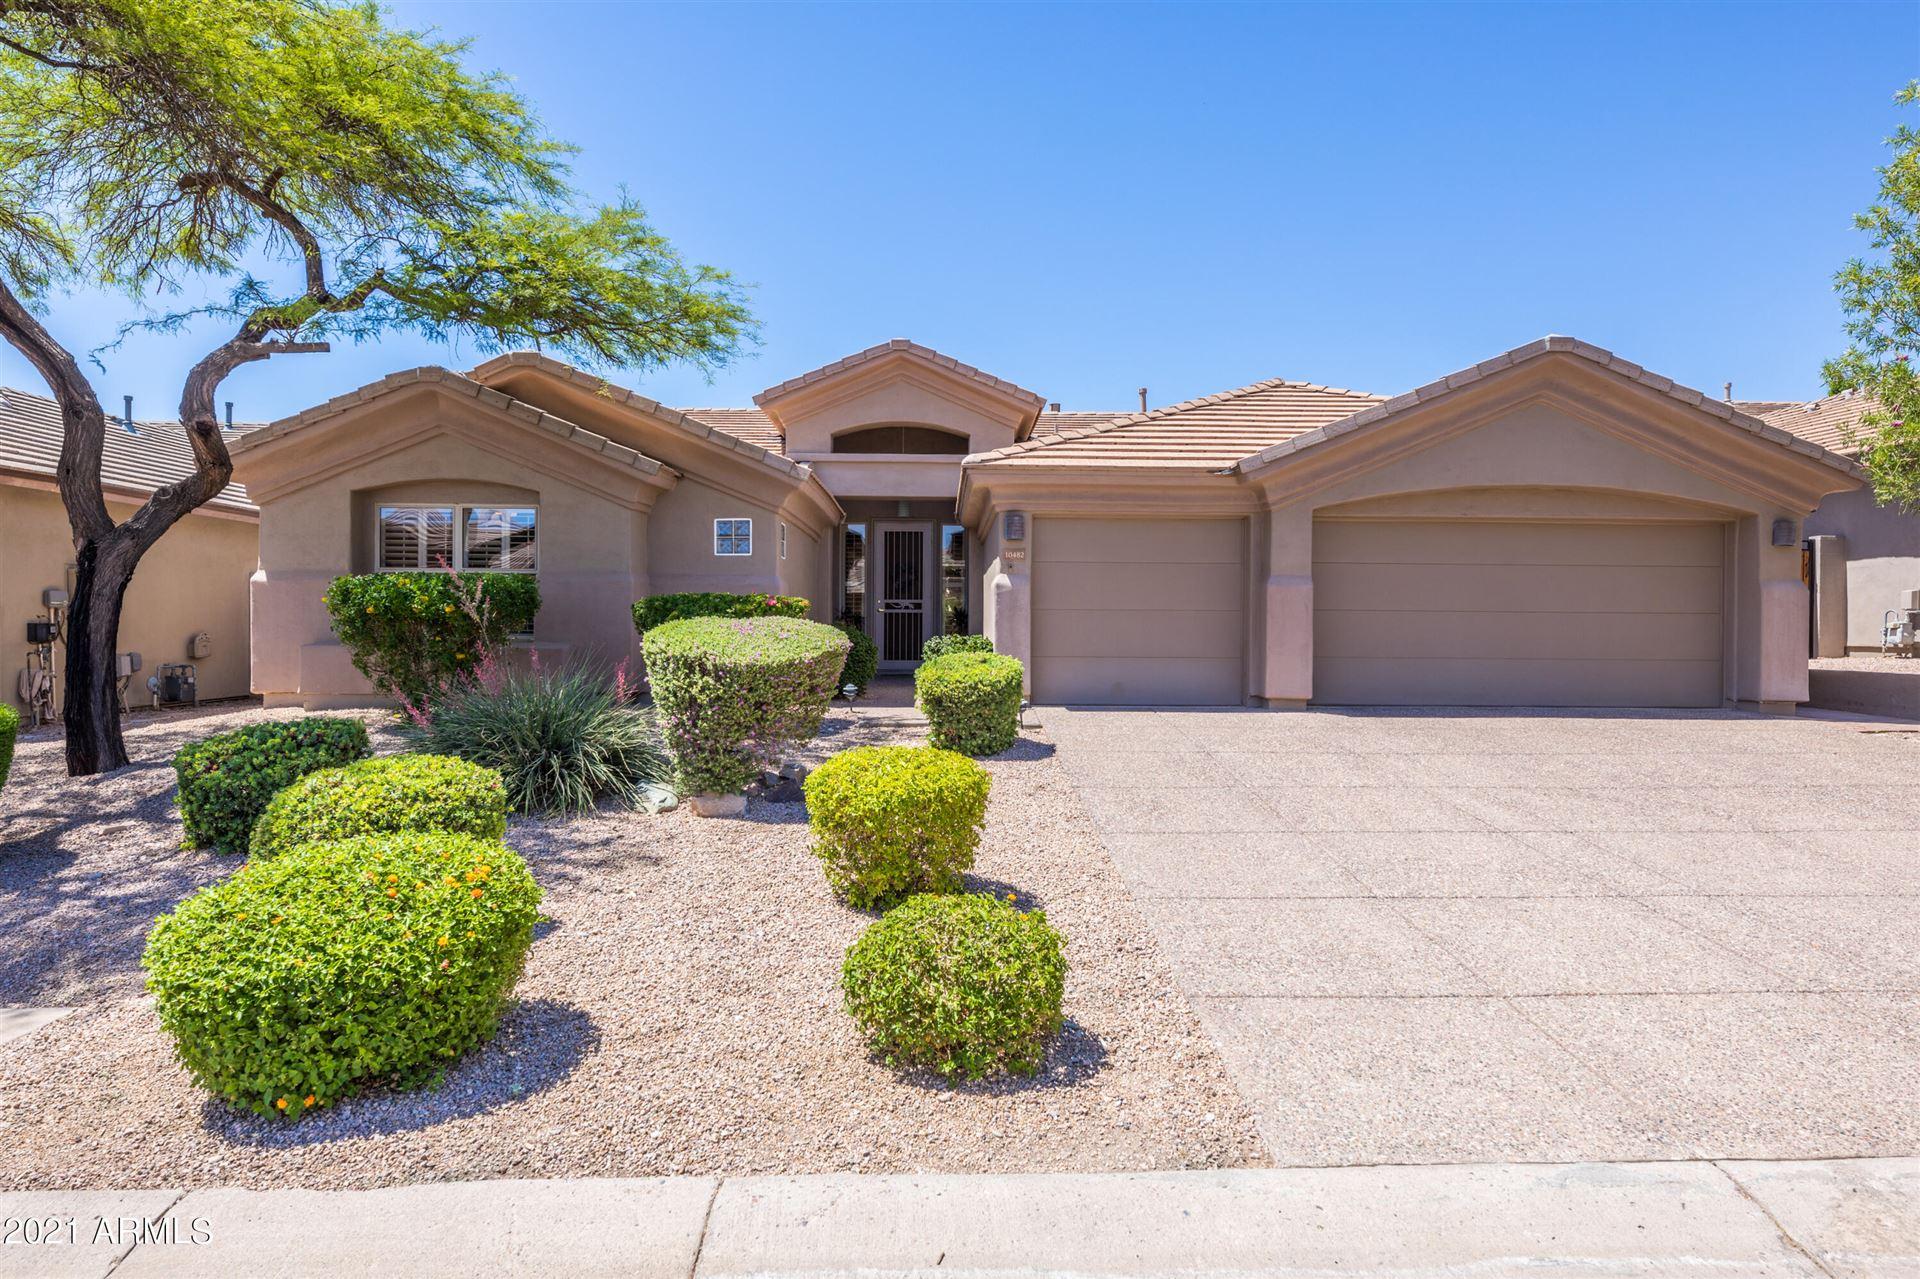 Photo of 10482 E BAHIA Drive, Scottsdale, AZ 85255 (MLS # 6246820)